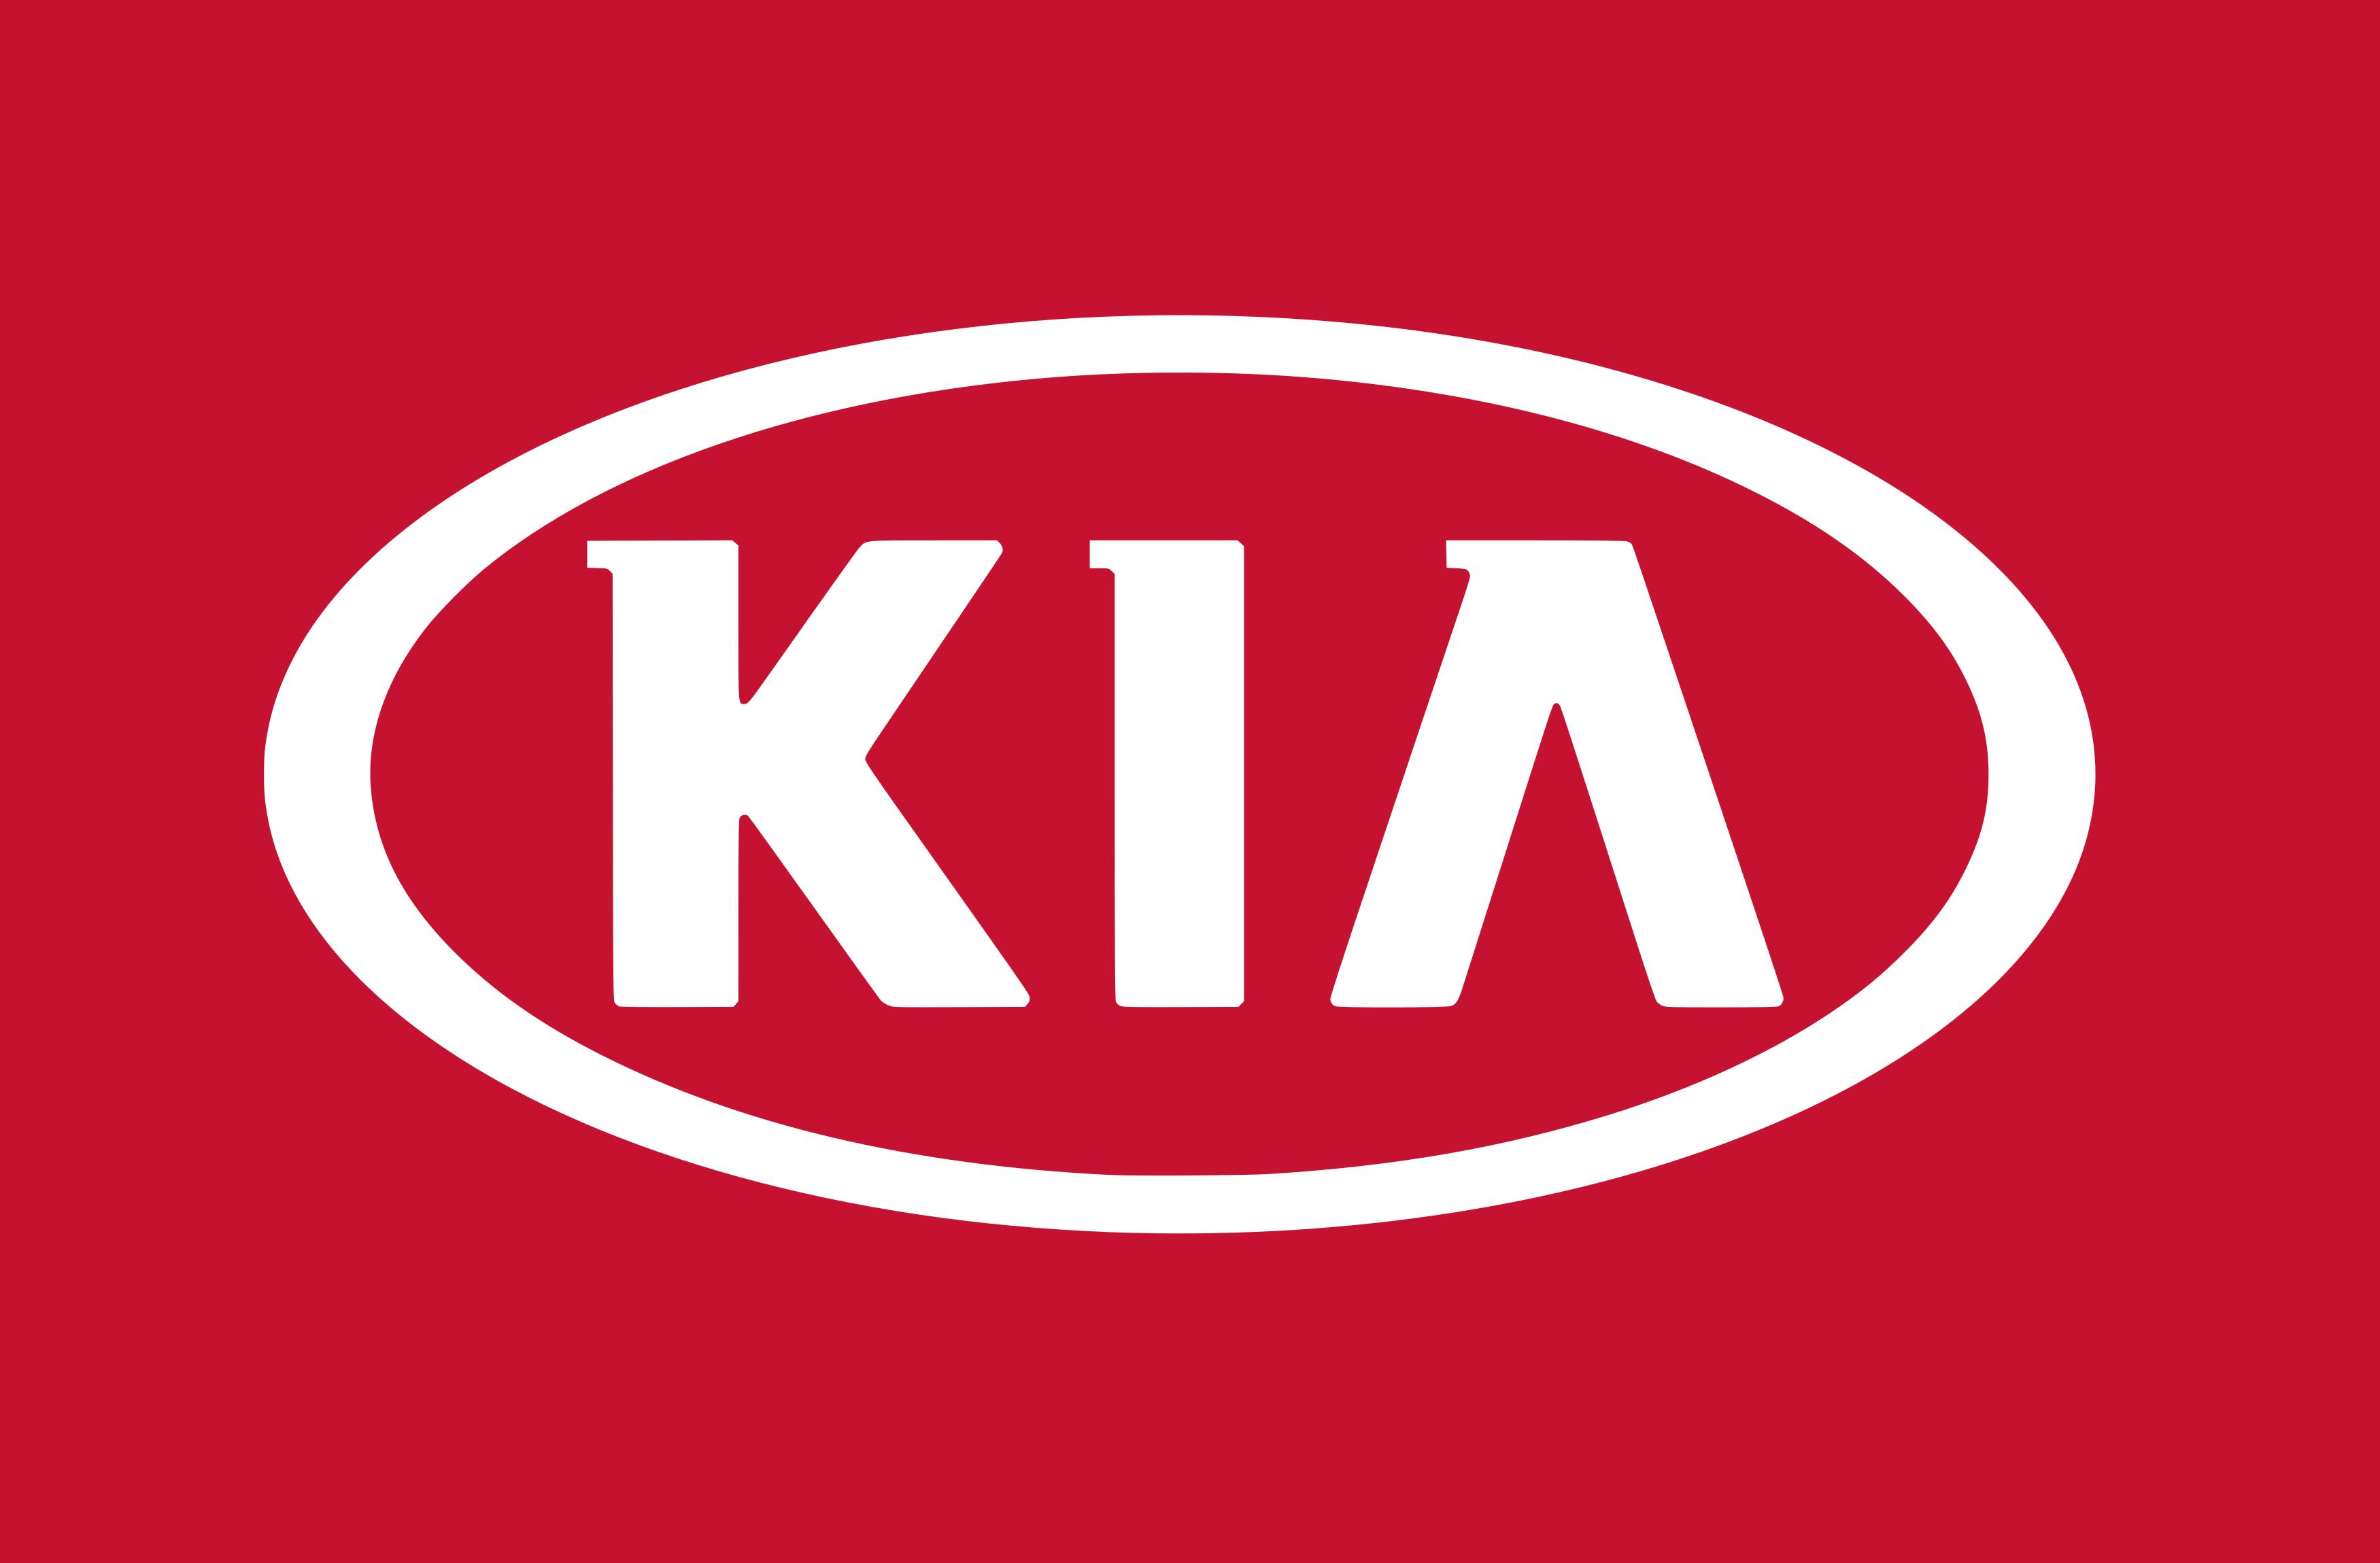 Logo Toyota Png >> Kia Motors Logo - PNG e Vetor - Download de Logotipos